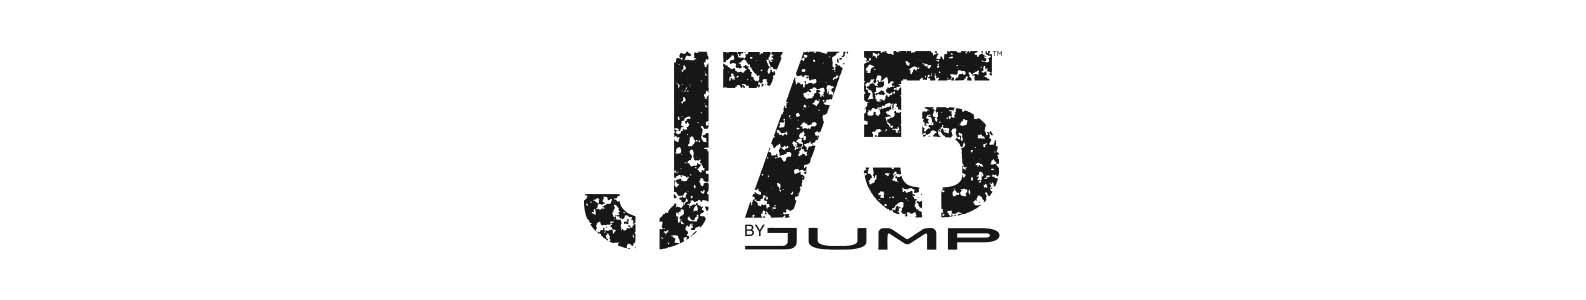 J75 brand header image